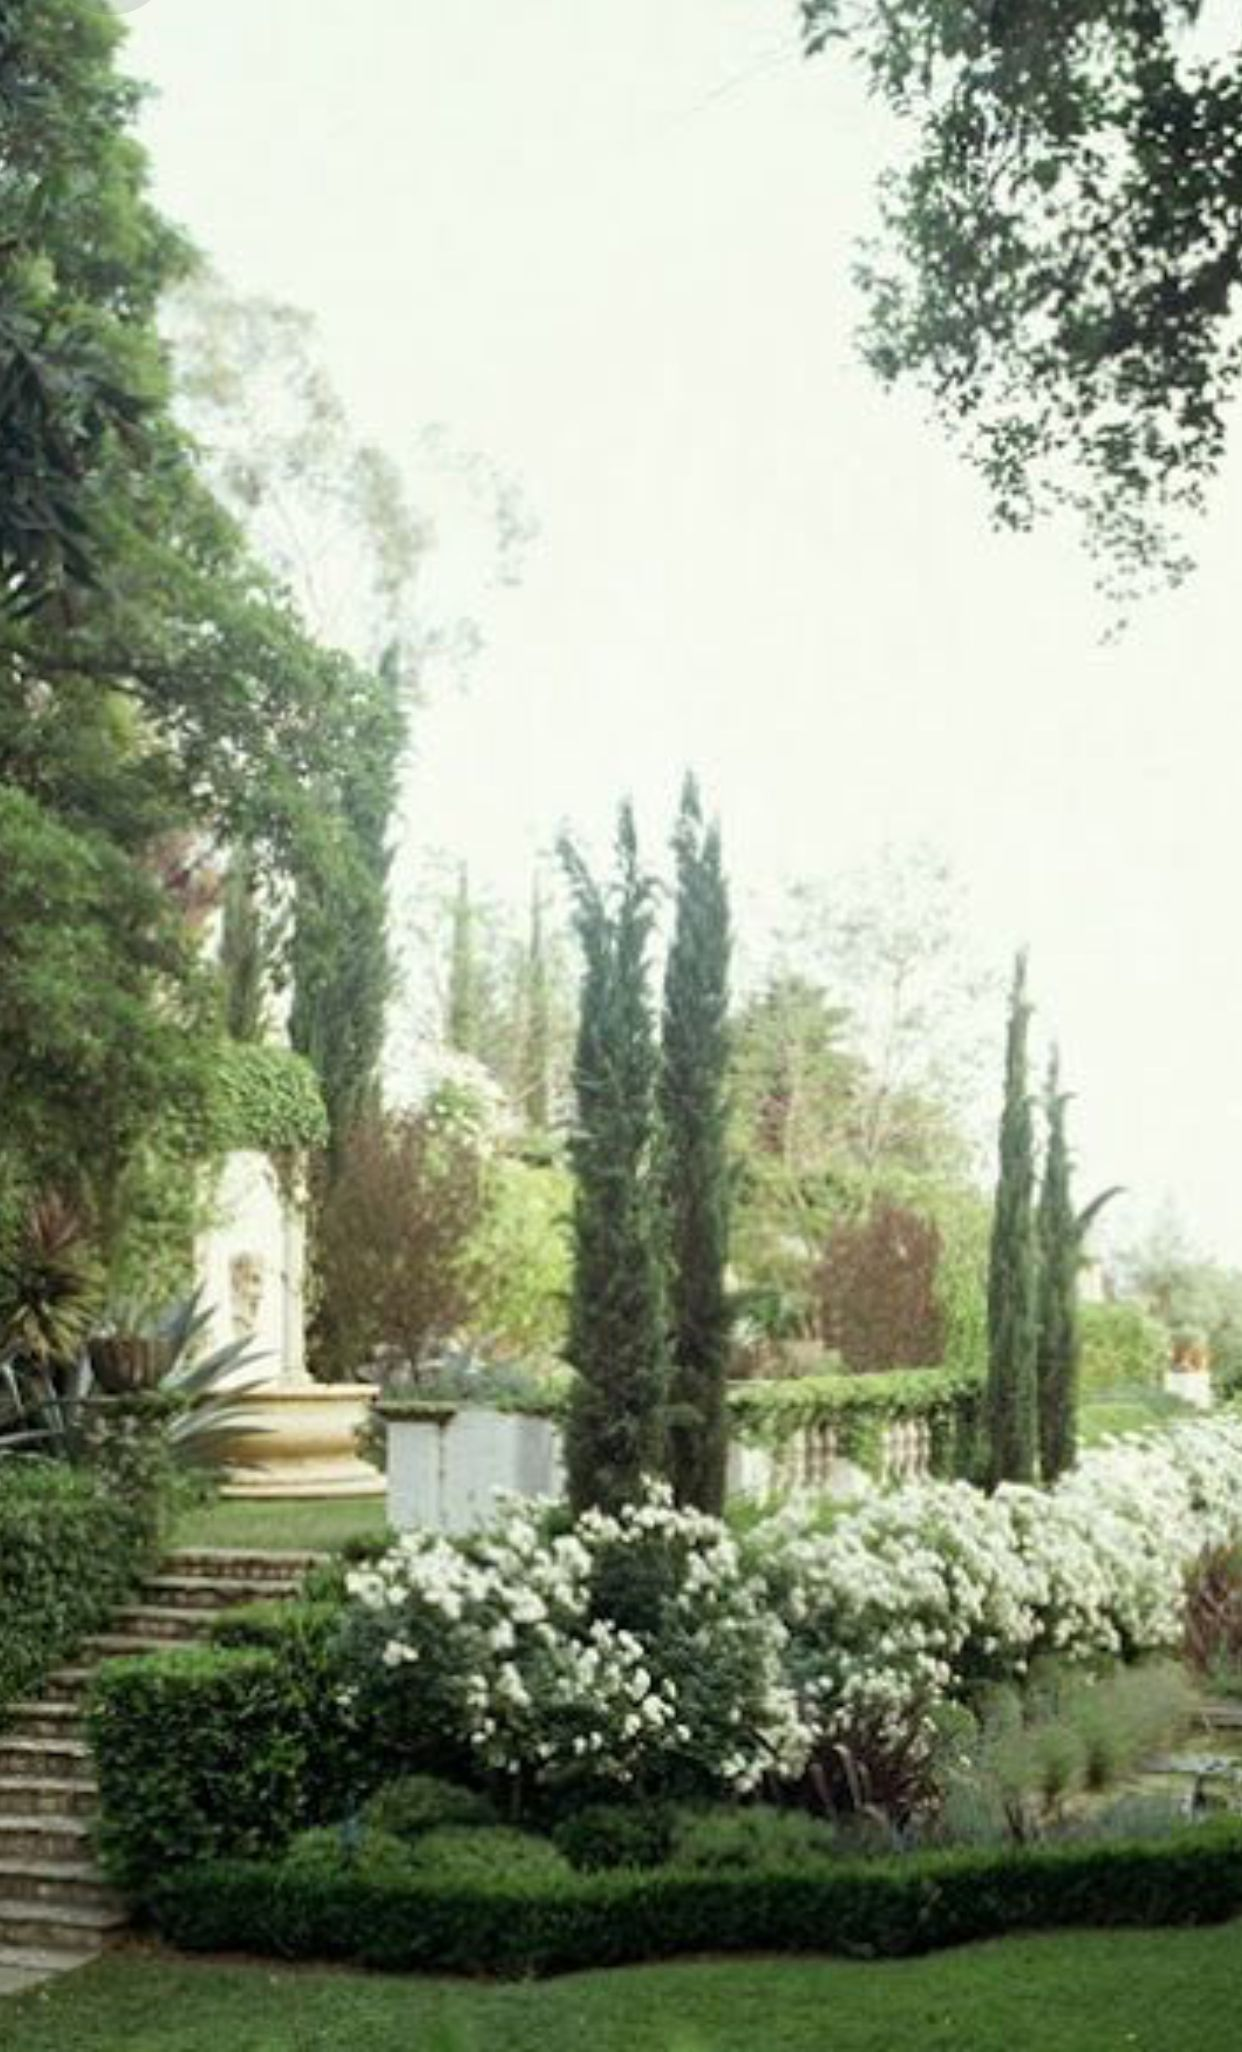 épinglé par Ginny Hebert sur Formal Gardens